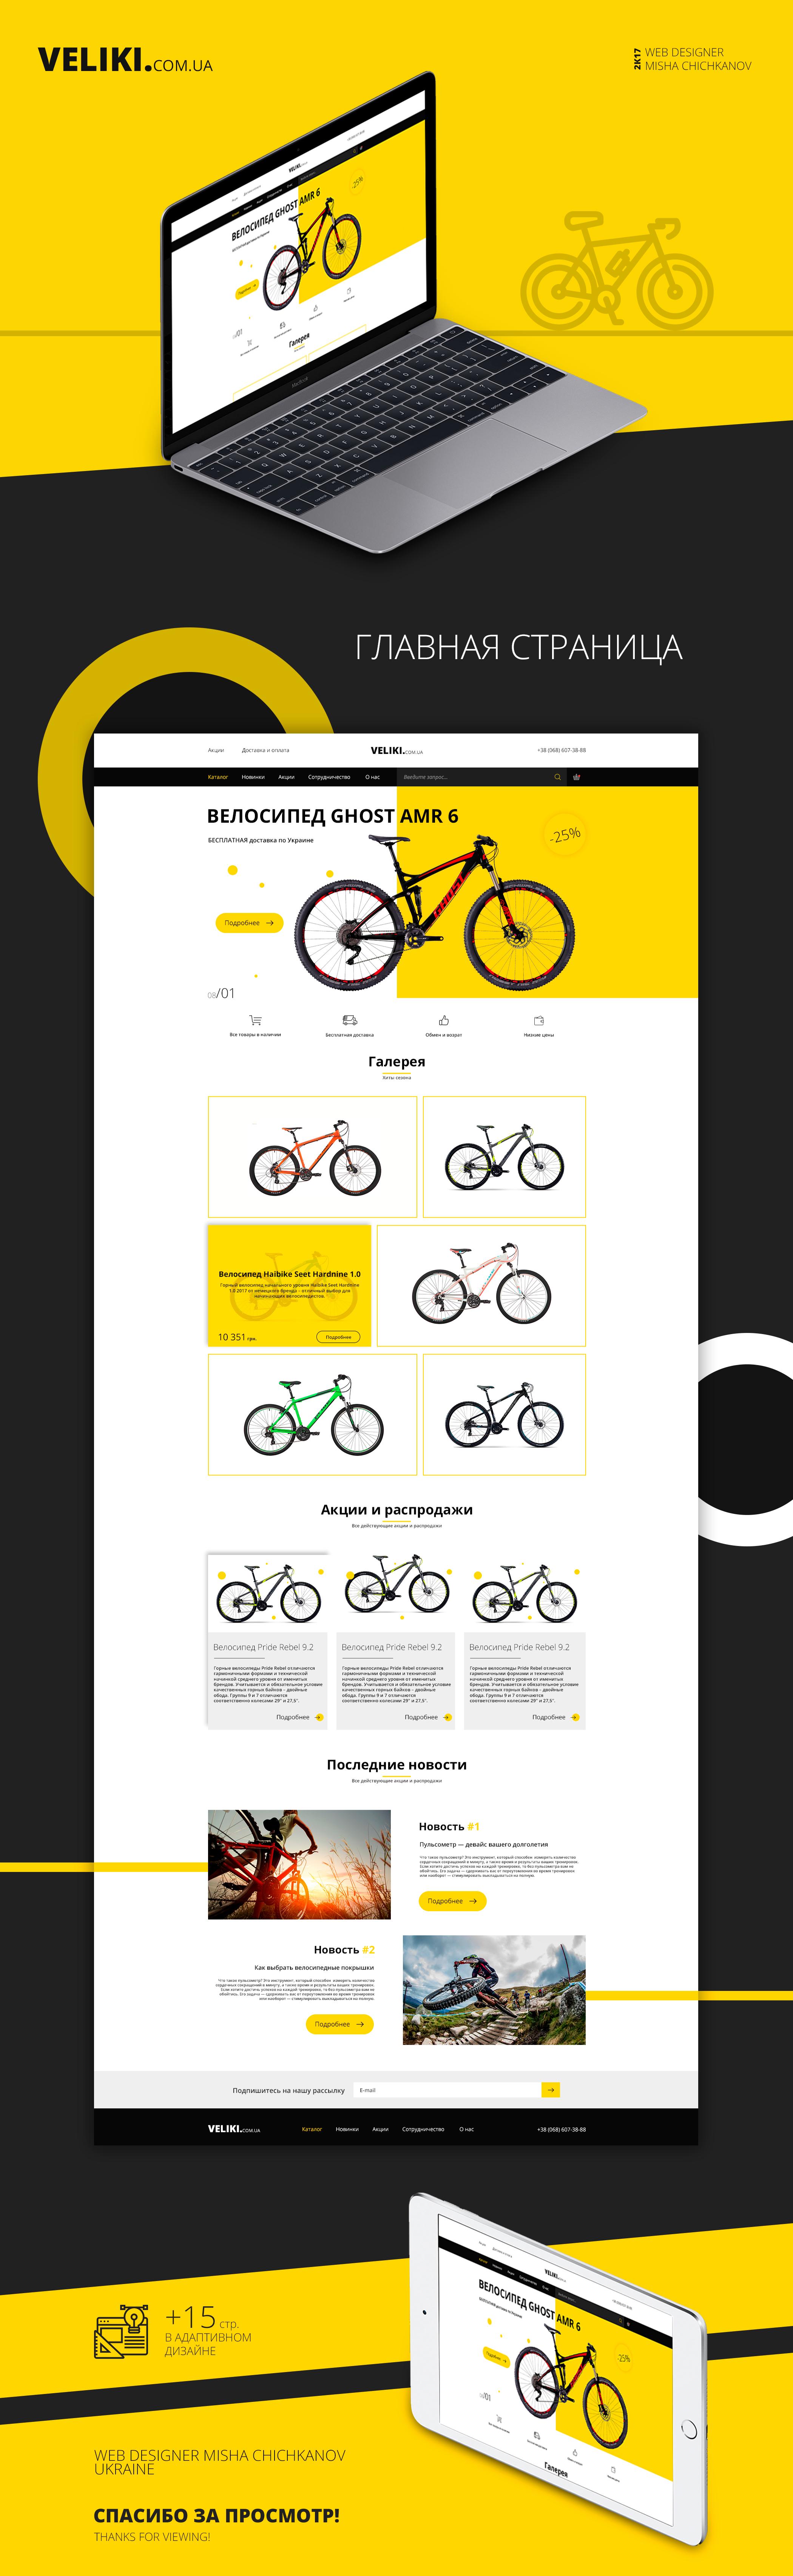 Дизайн+адаптив. VELIKI.com.ua